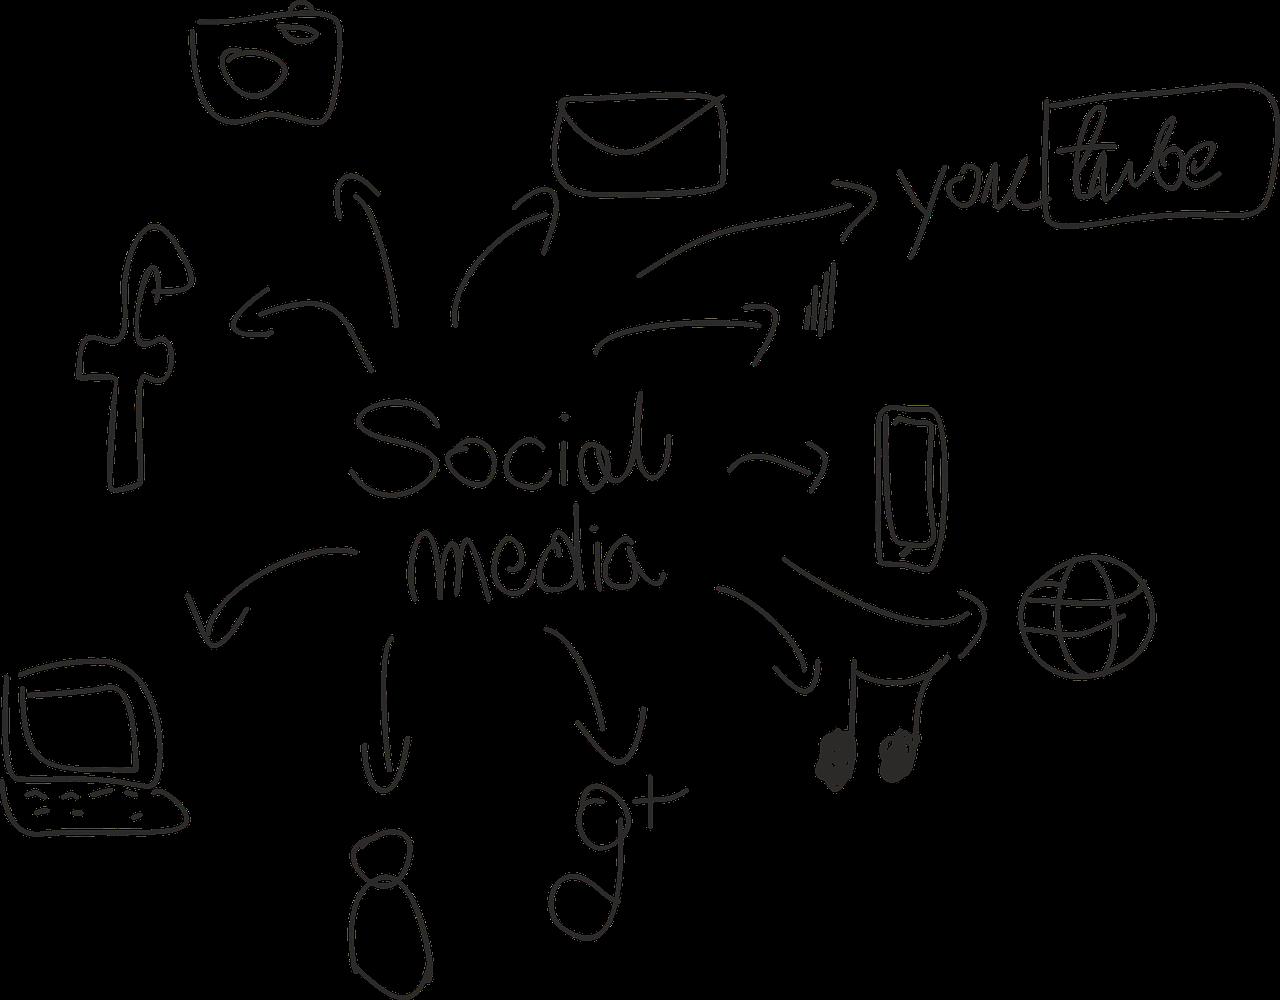 Promote it On Social Media